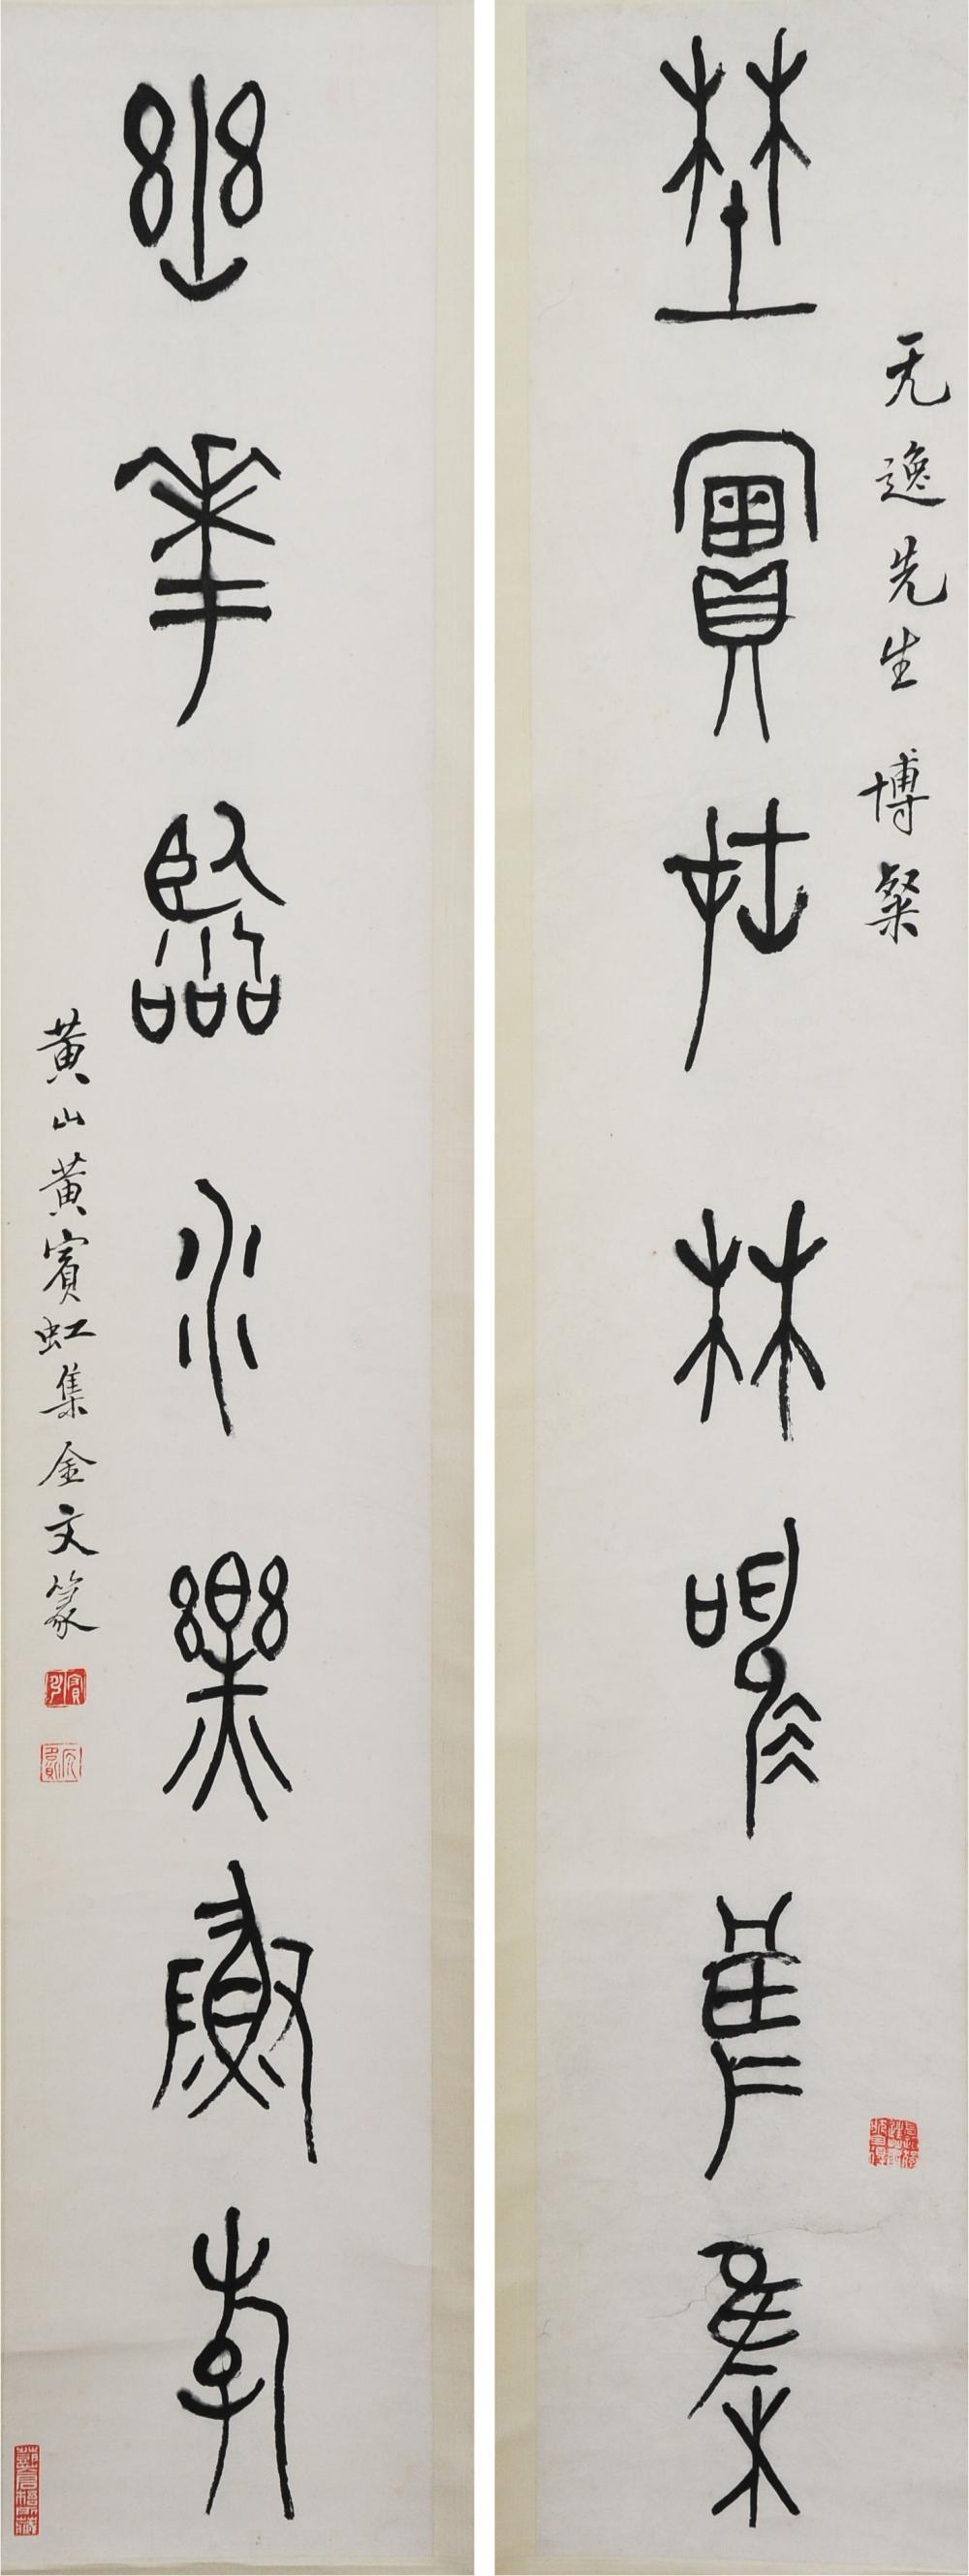 7-CHARACTER CALLIGRAPHY COUPLET BY HUANG BINHONG